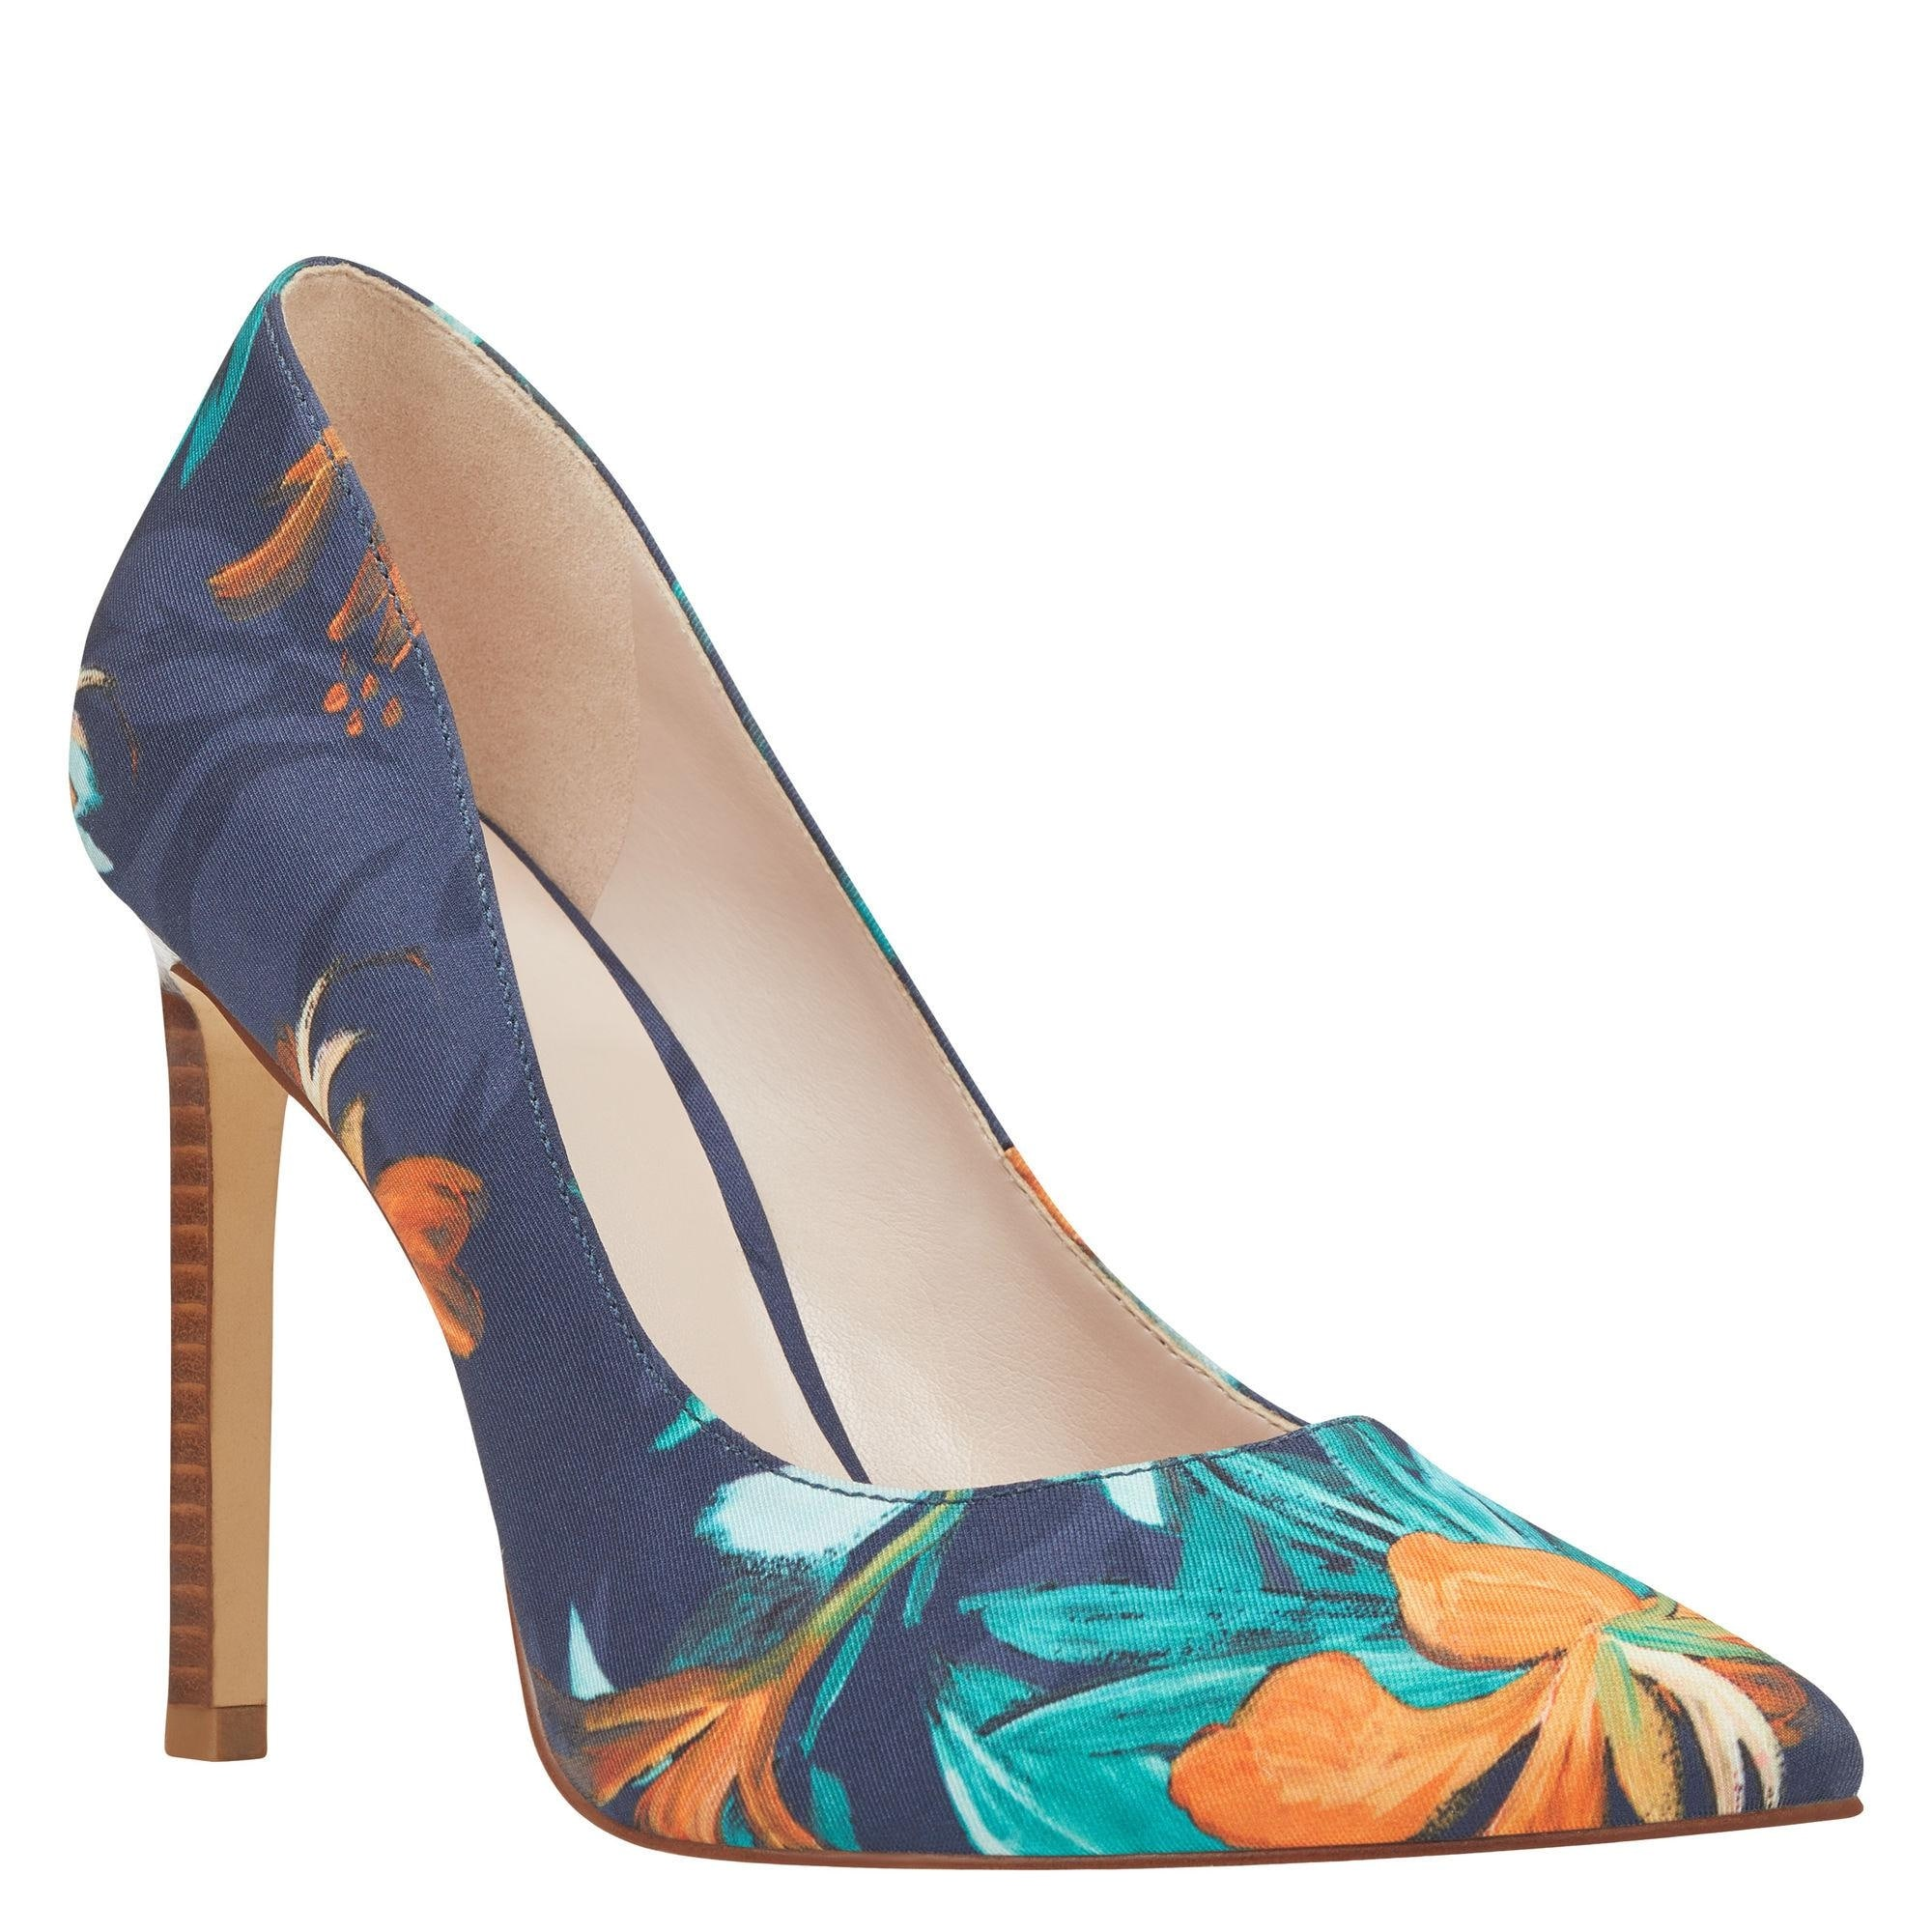 432d87daaf0 Nine West Shoes